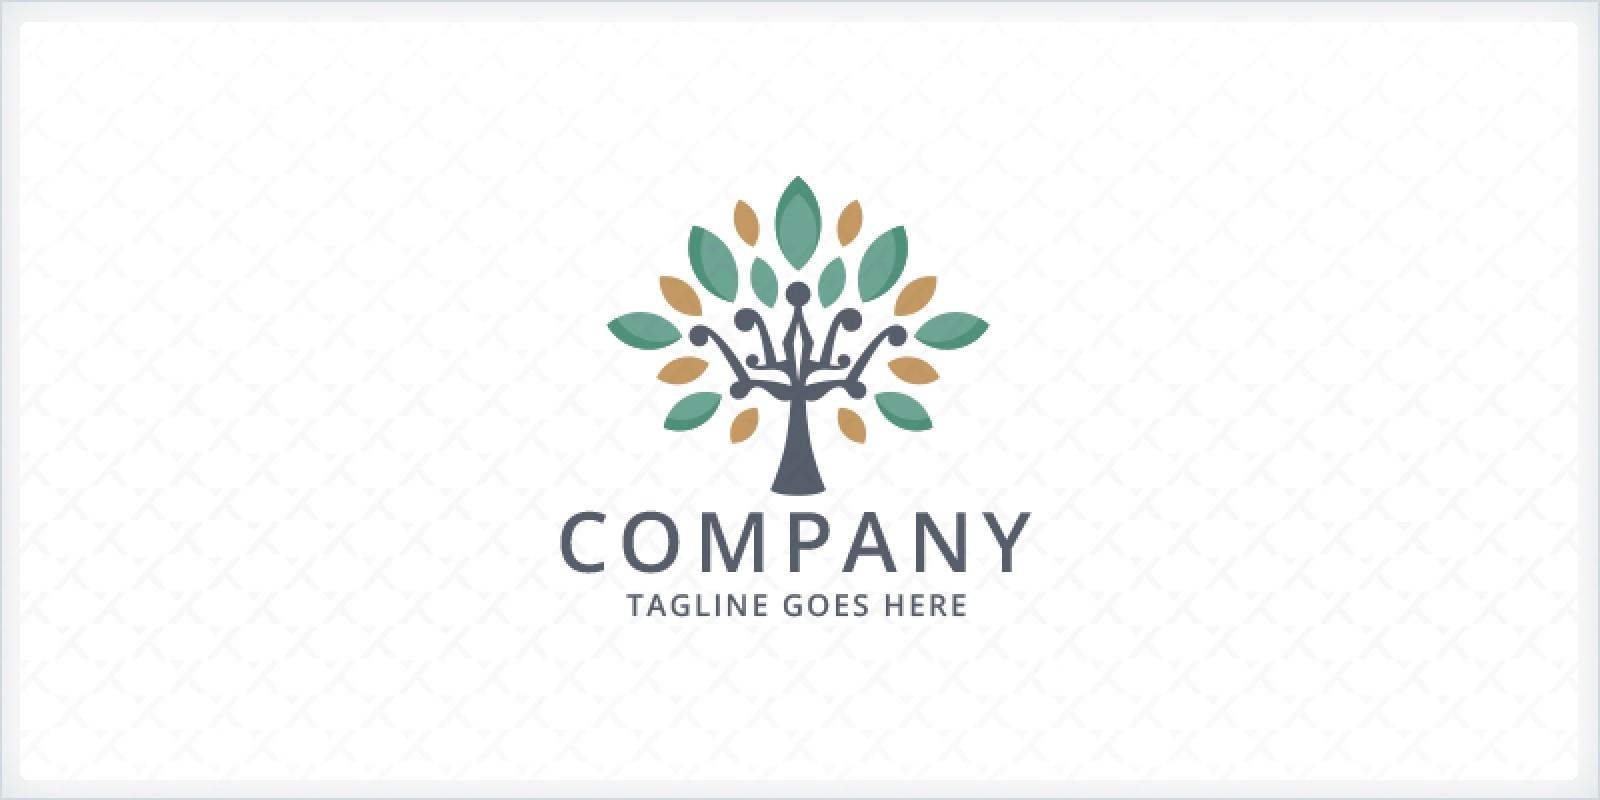 Crown Tree Logo